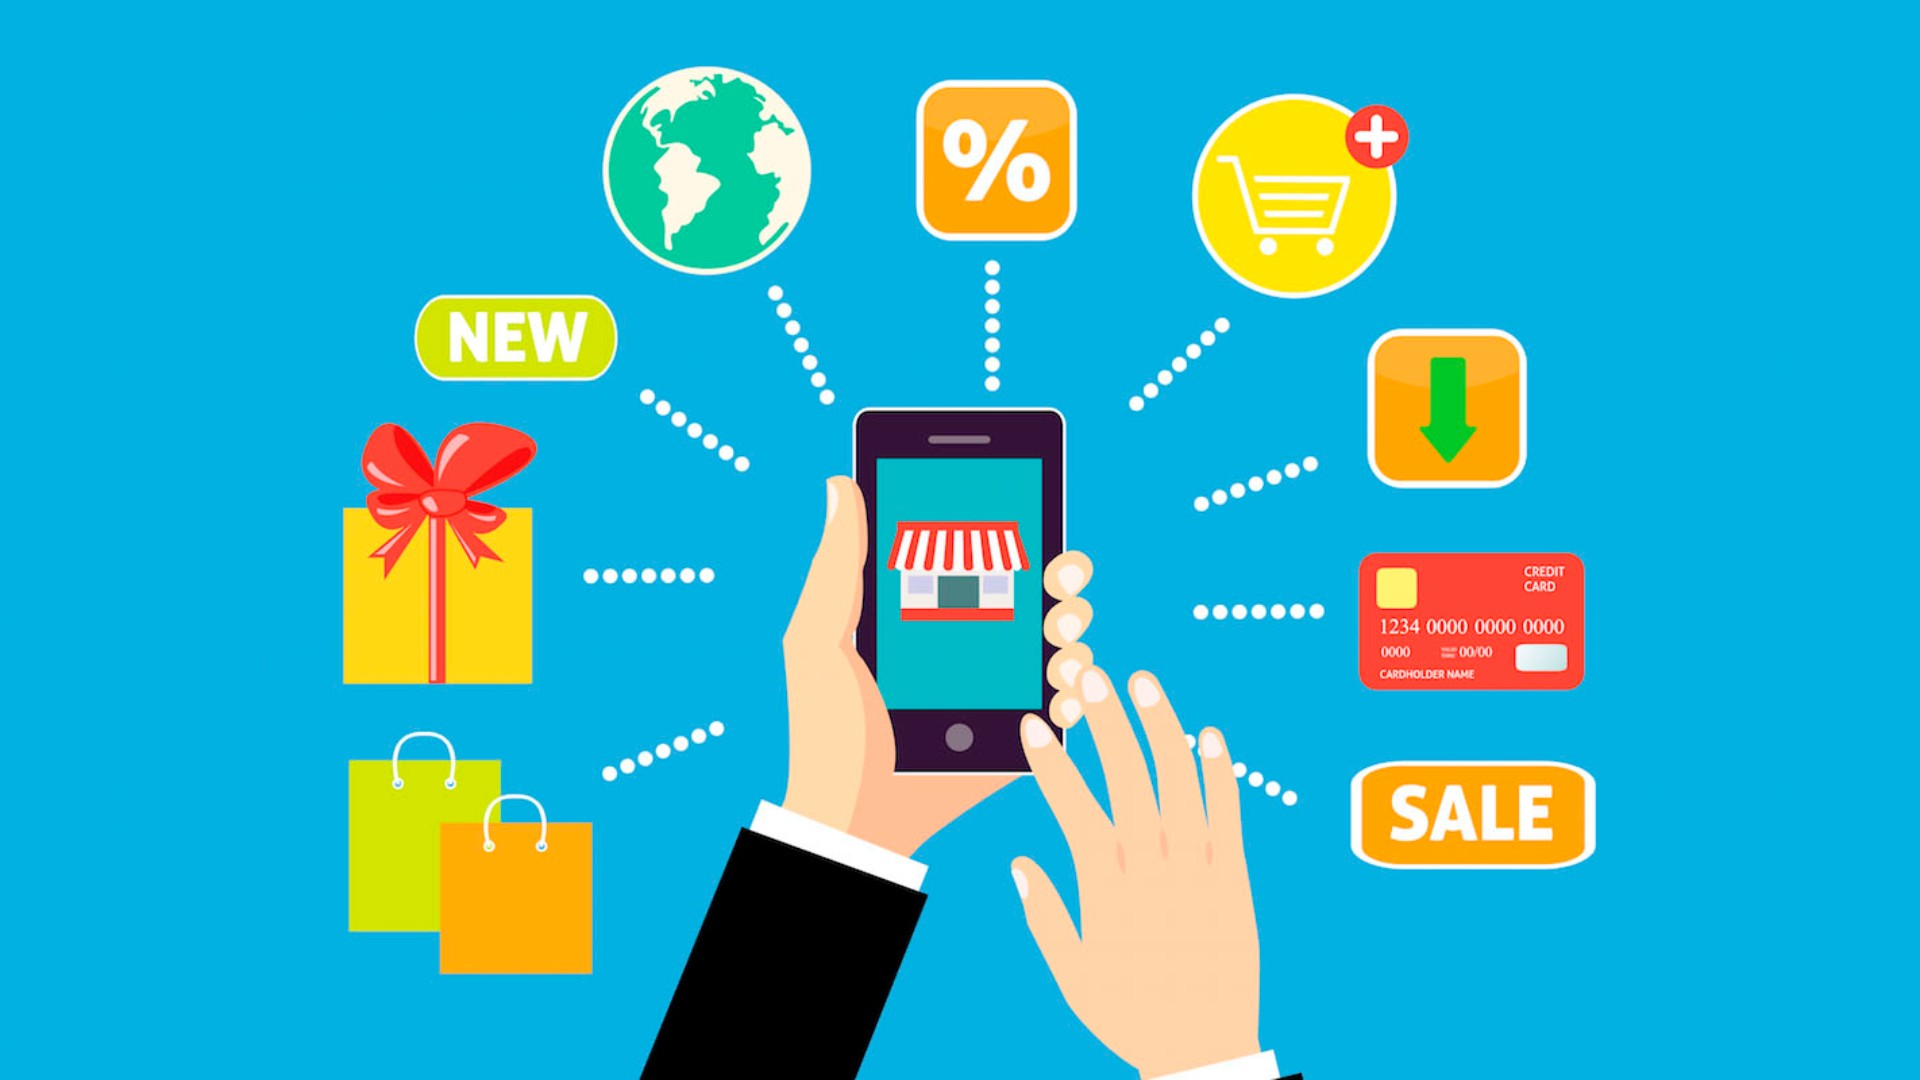 creacion-tiendas-online-en-el-prat-de-llobregat